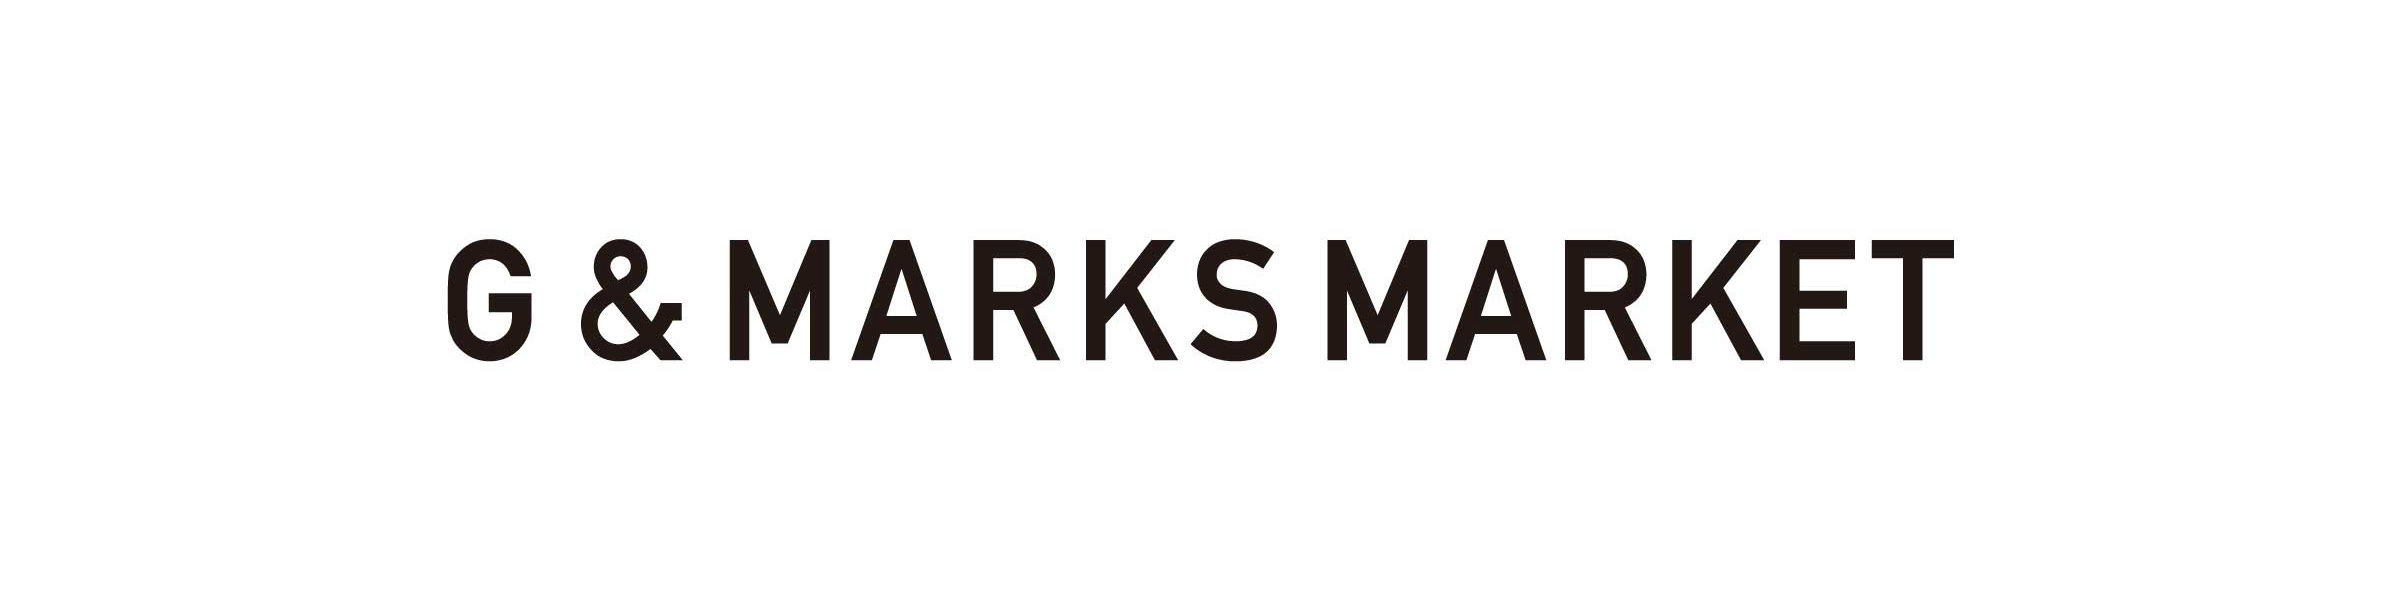 G&MARKS MARKET